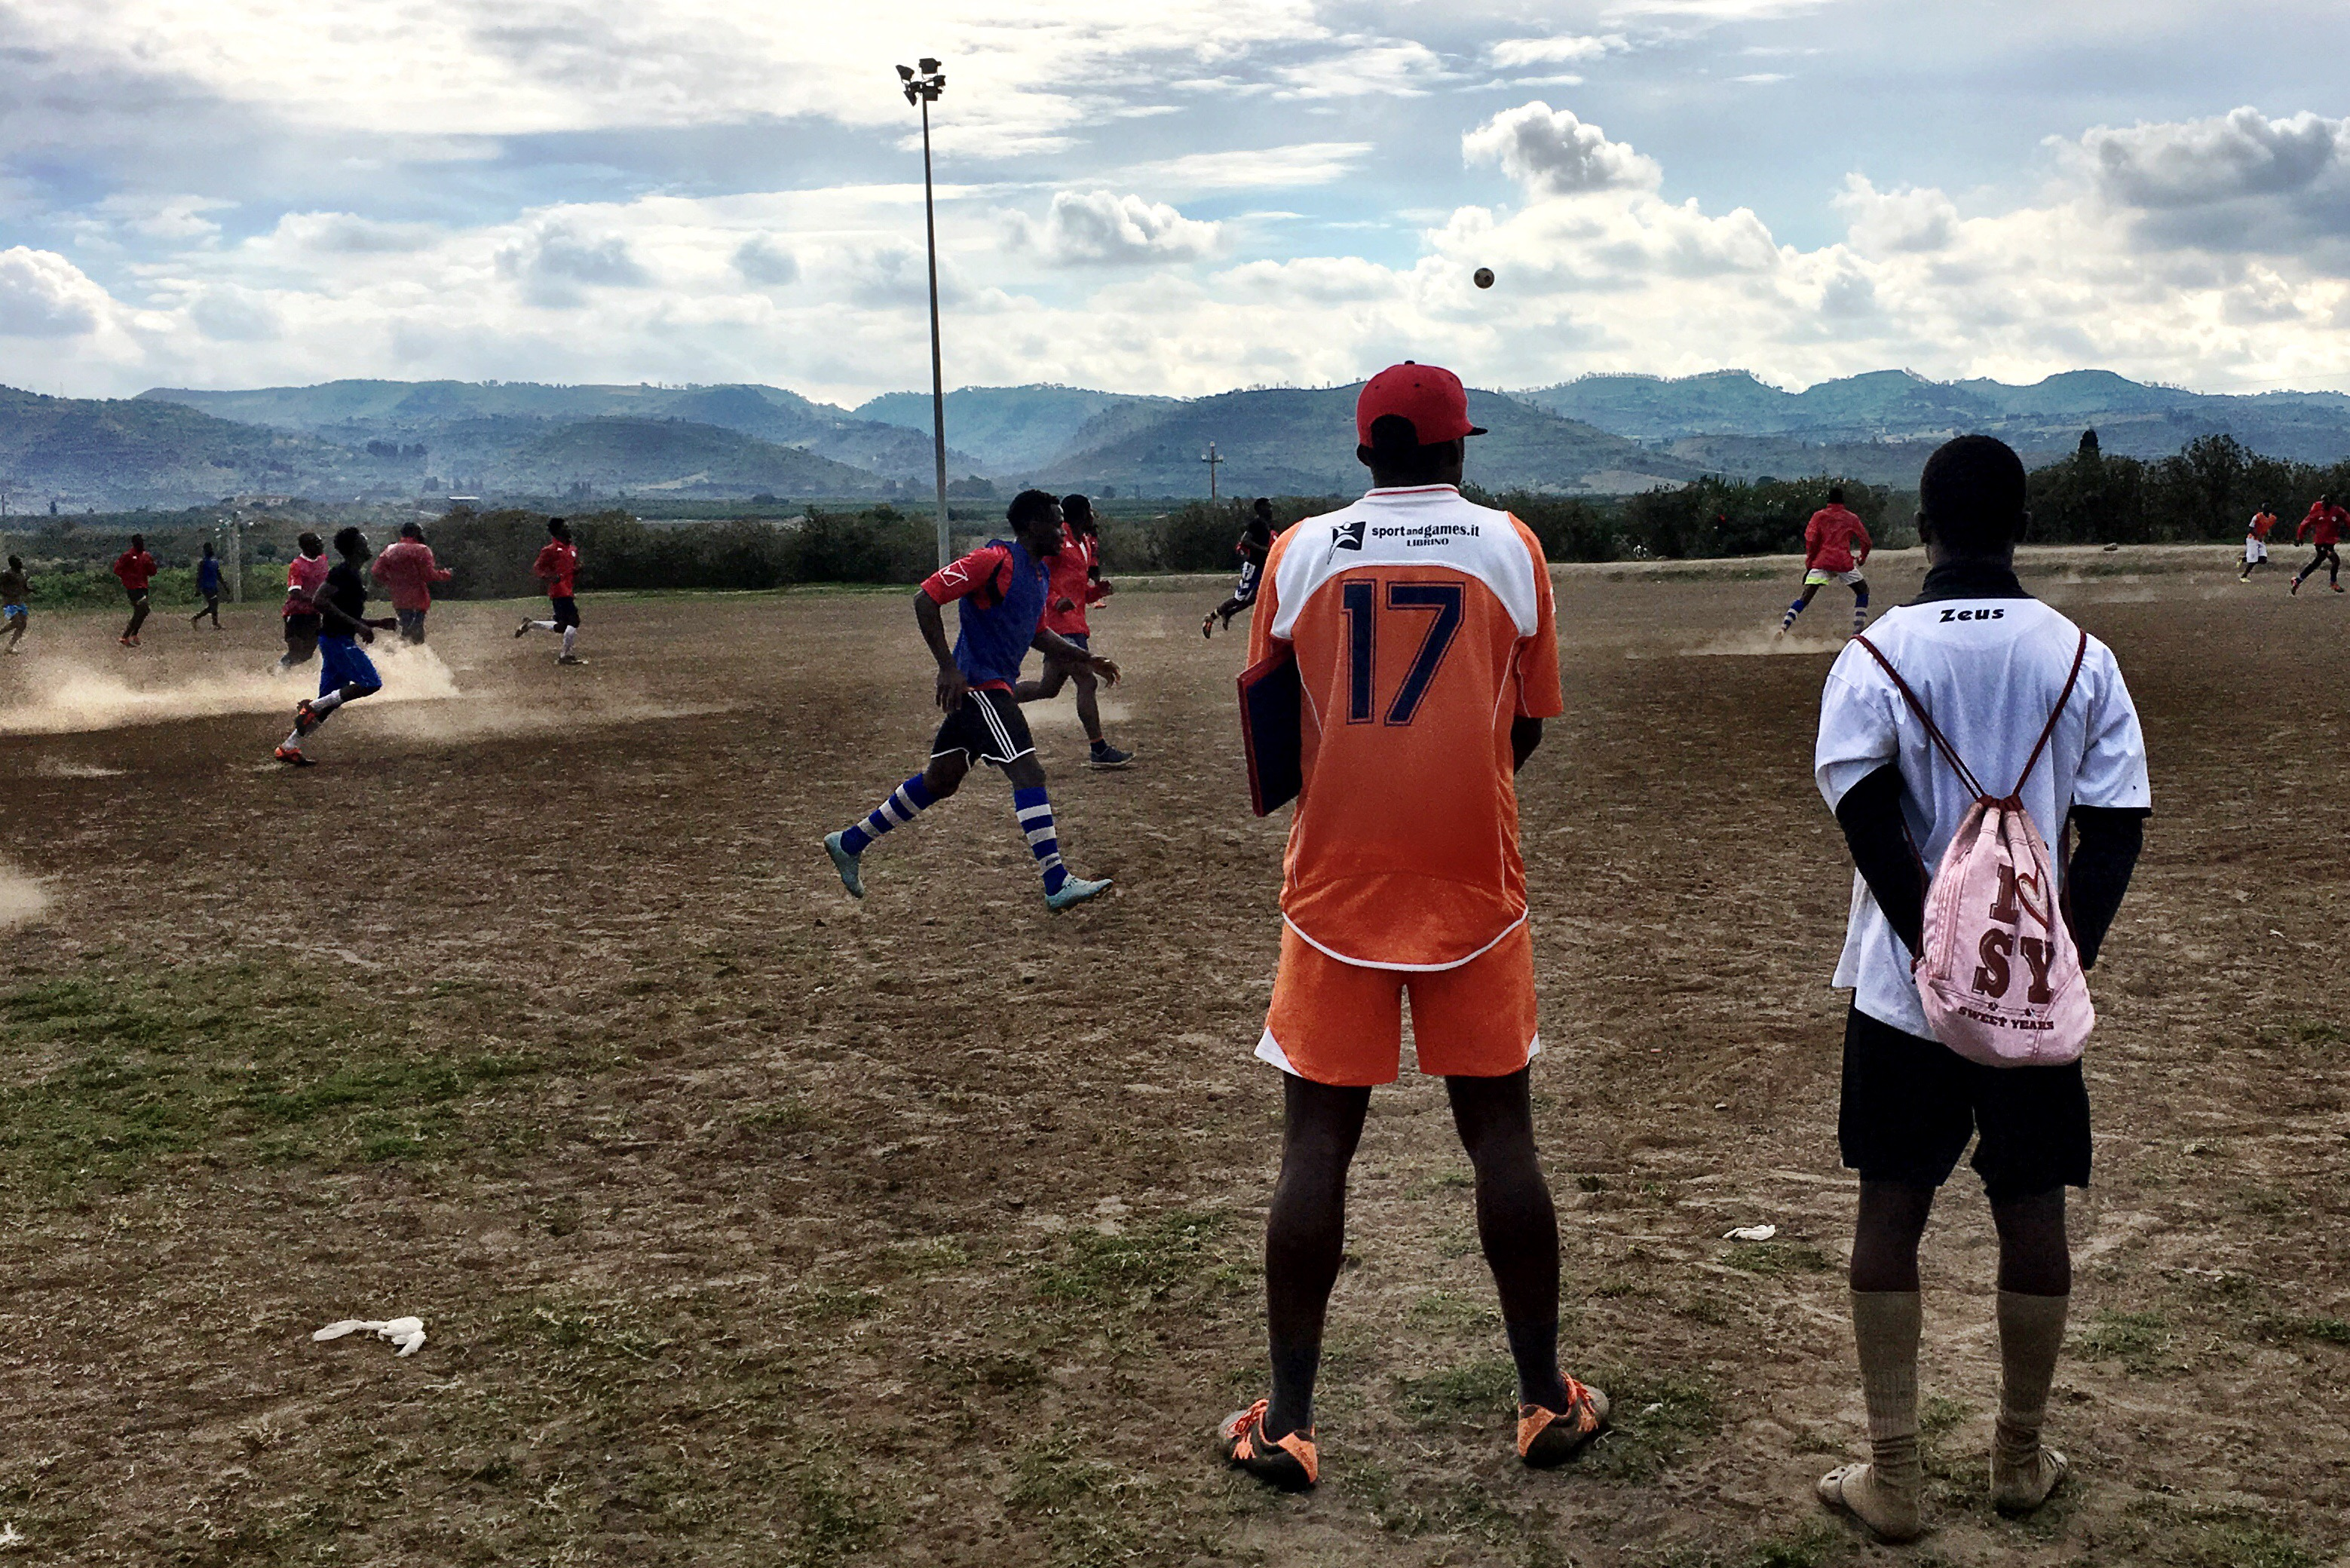 Recherche über Flüchtlinge in Catania – Knut-Krohn-Blog